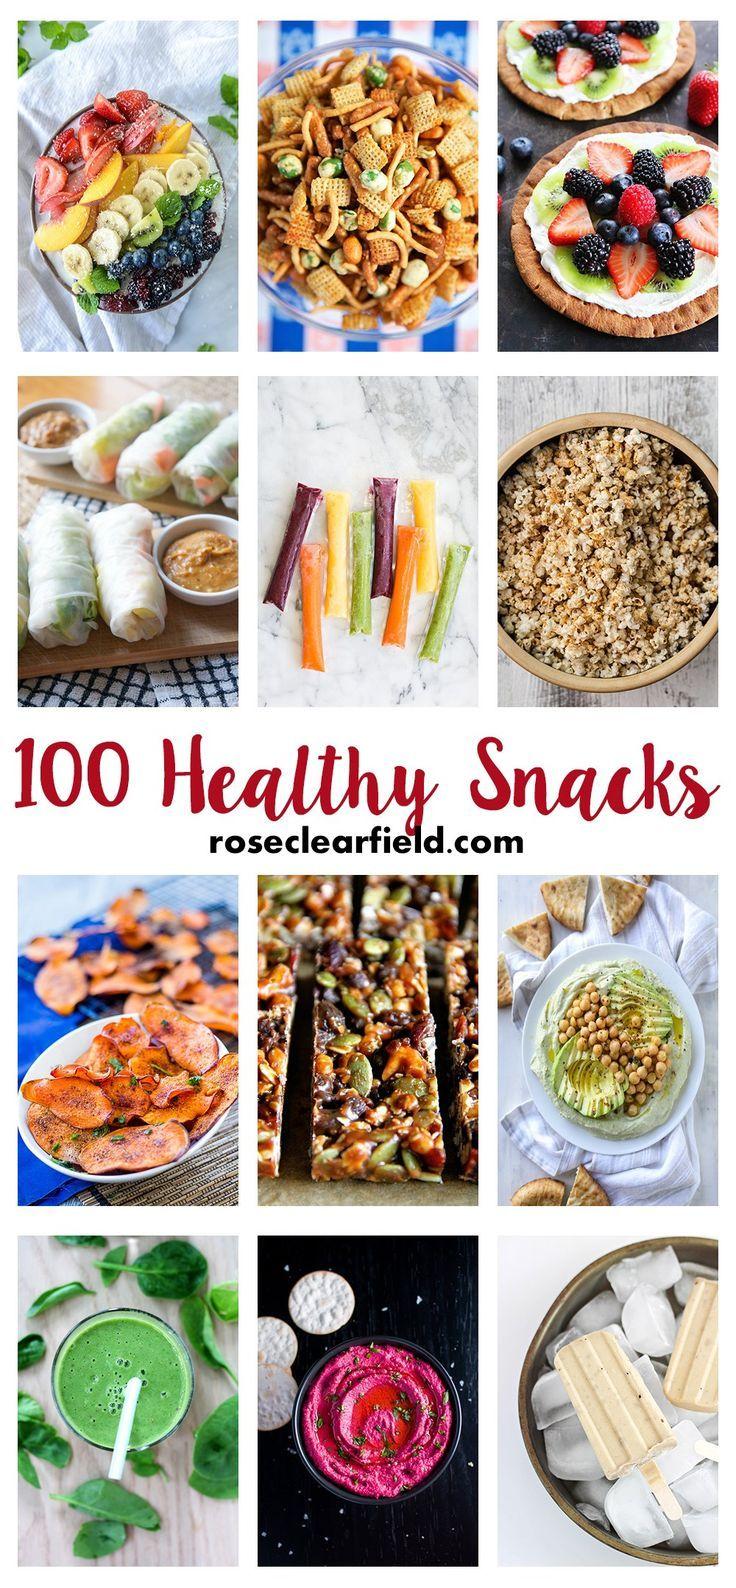 100 Healthy Snacks | http://www.roseclearfield.com